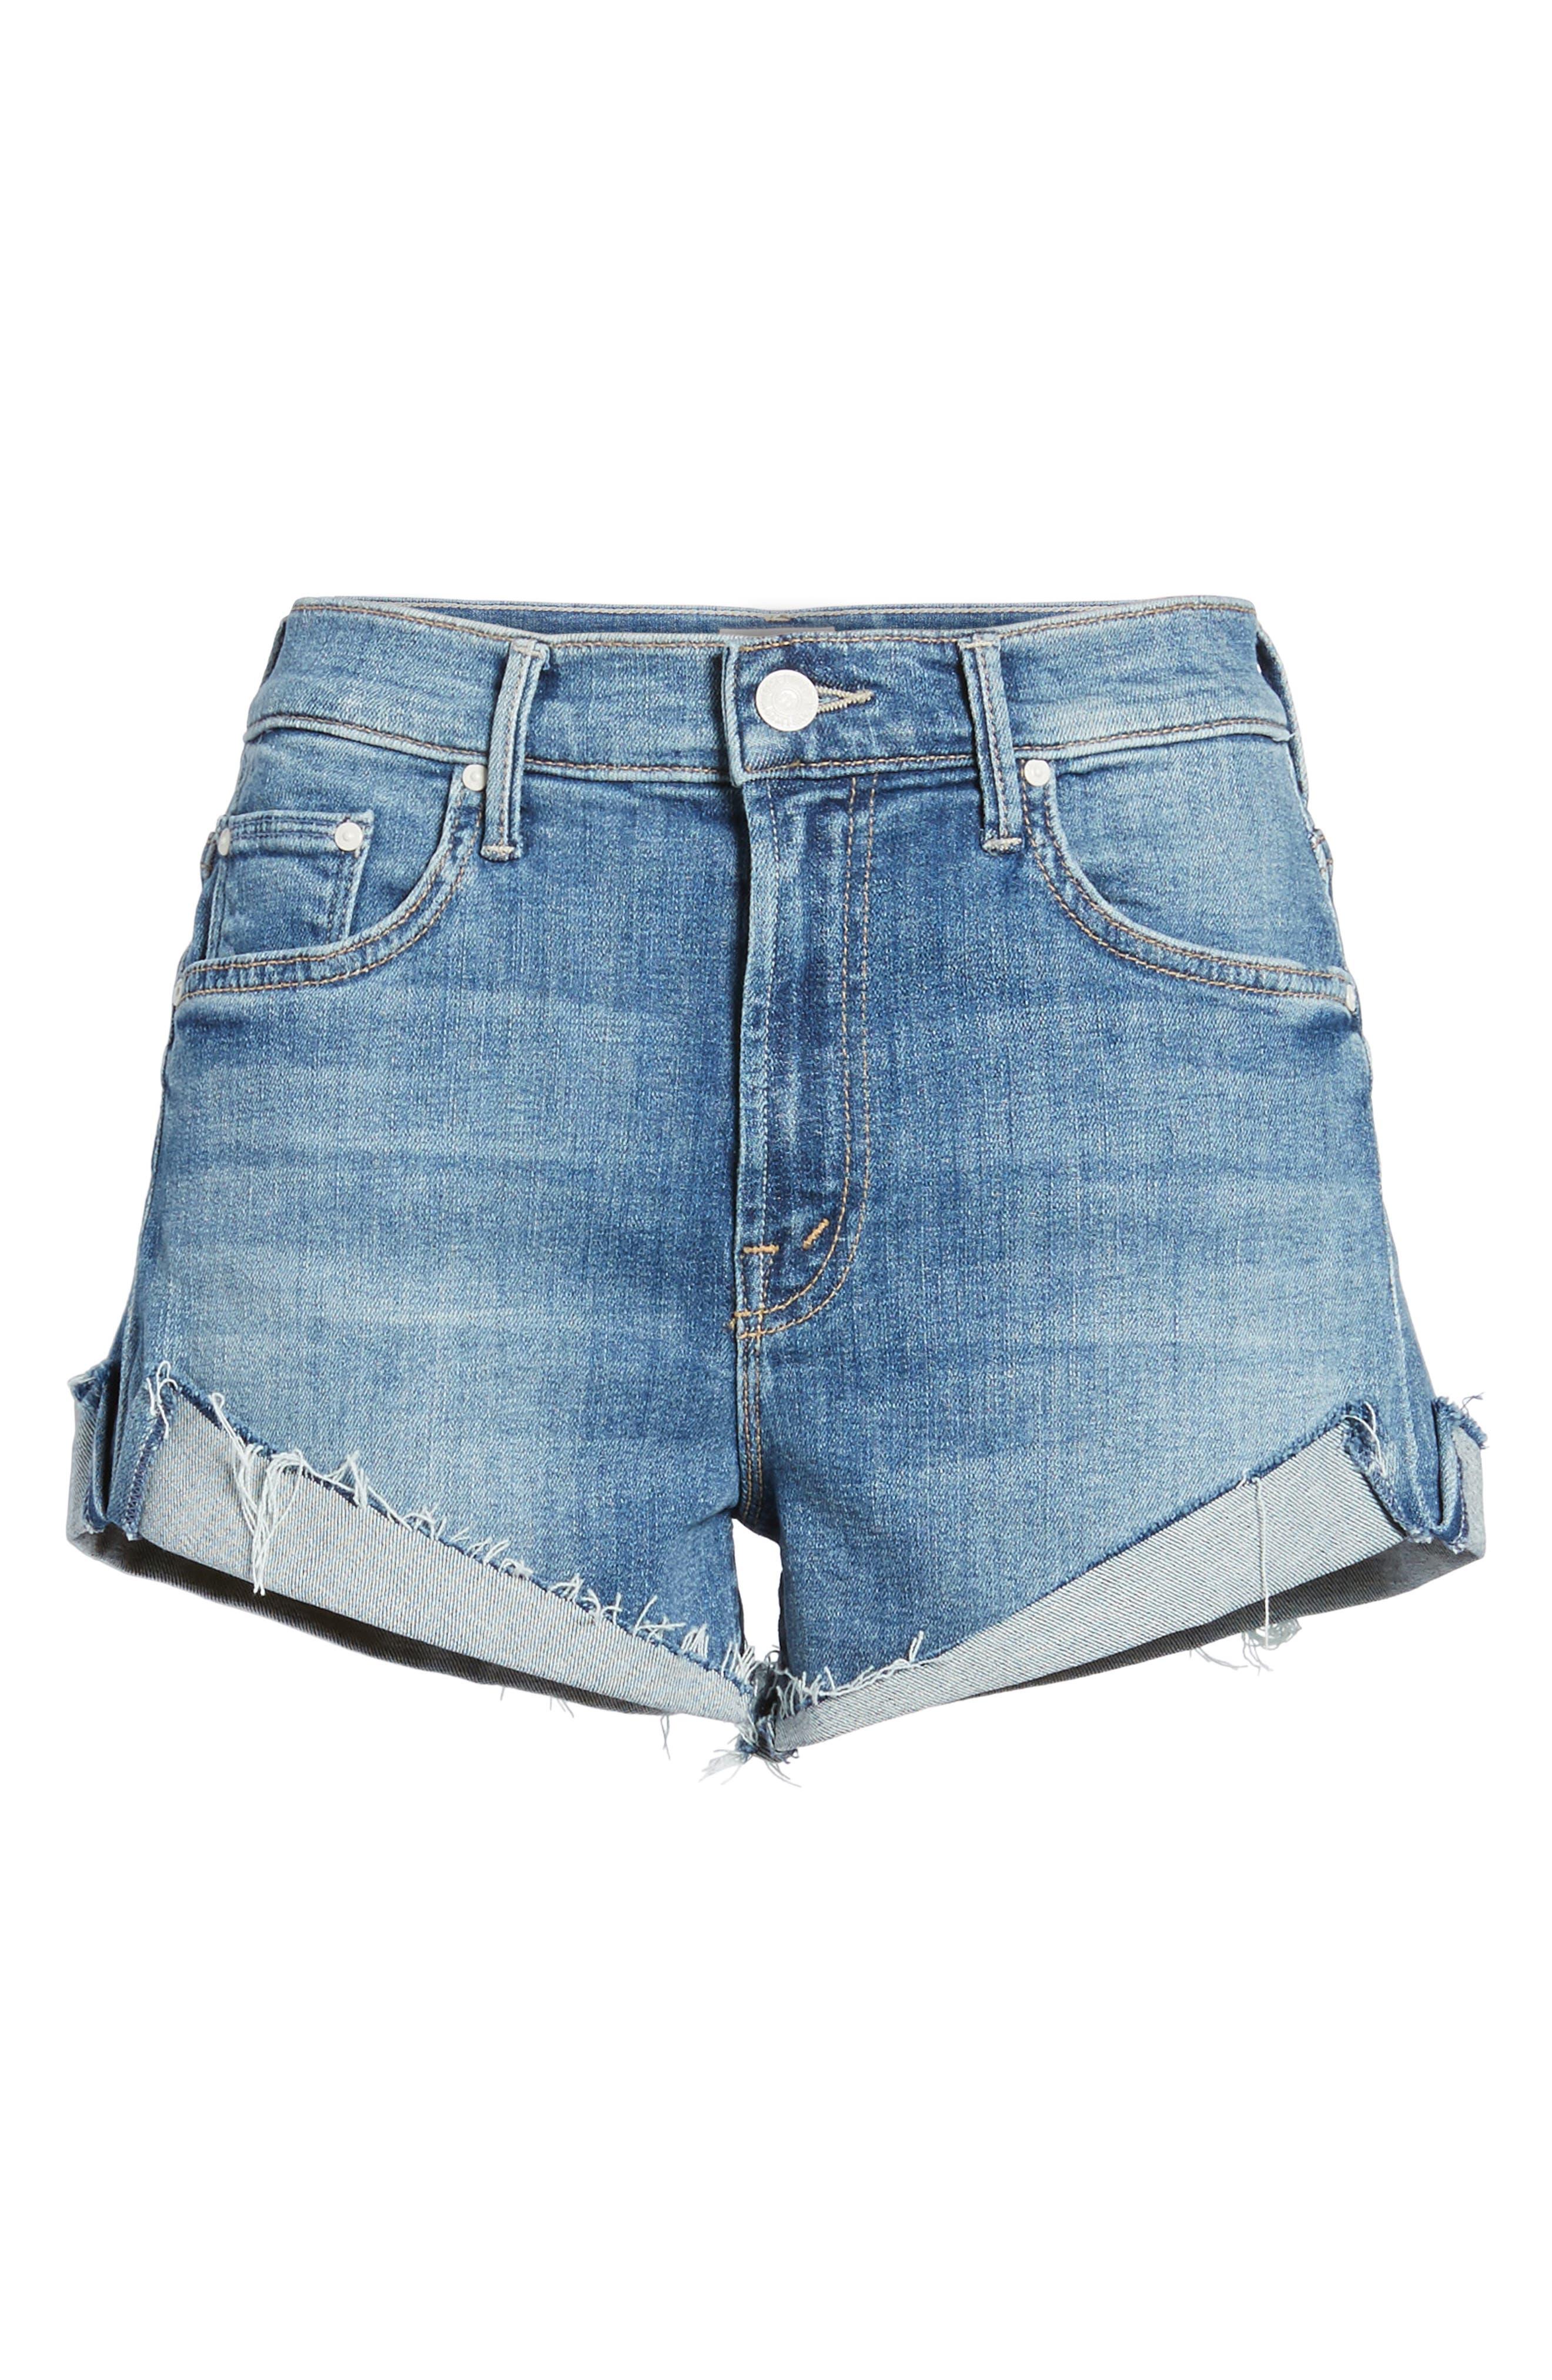 MOTHER, The Rascal Slit Flip Denim Shorts, Alternate thumbnail 7, color, ONE SMART COOKIE